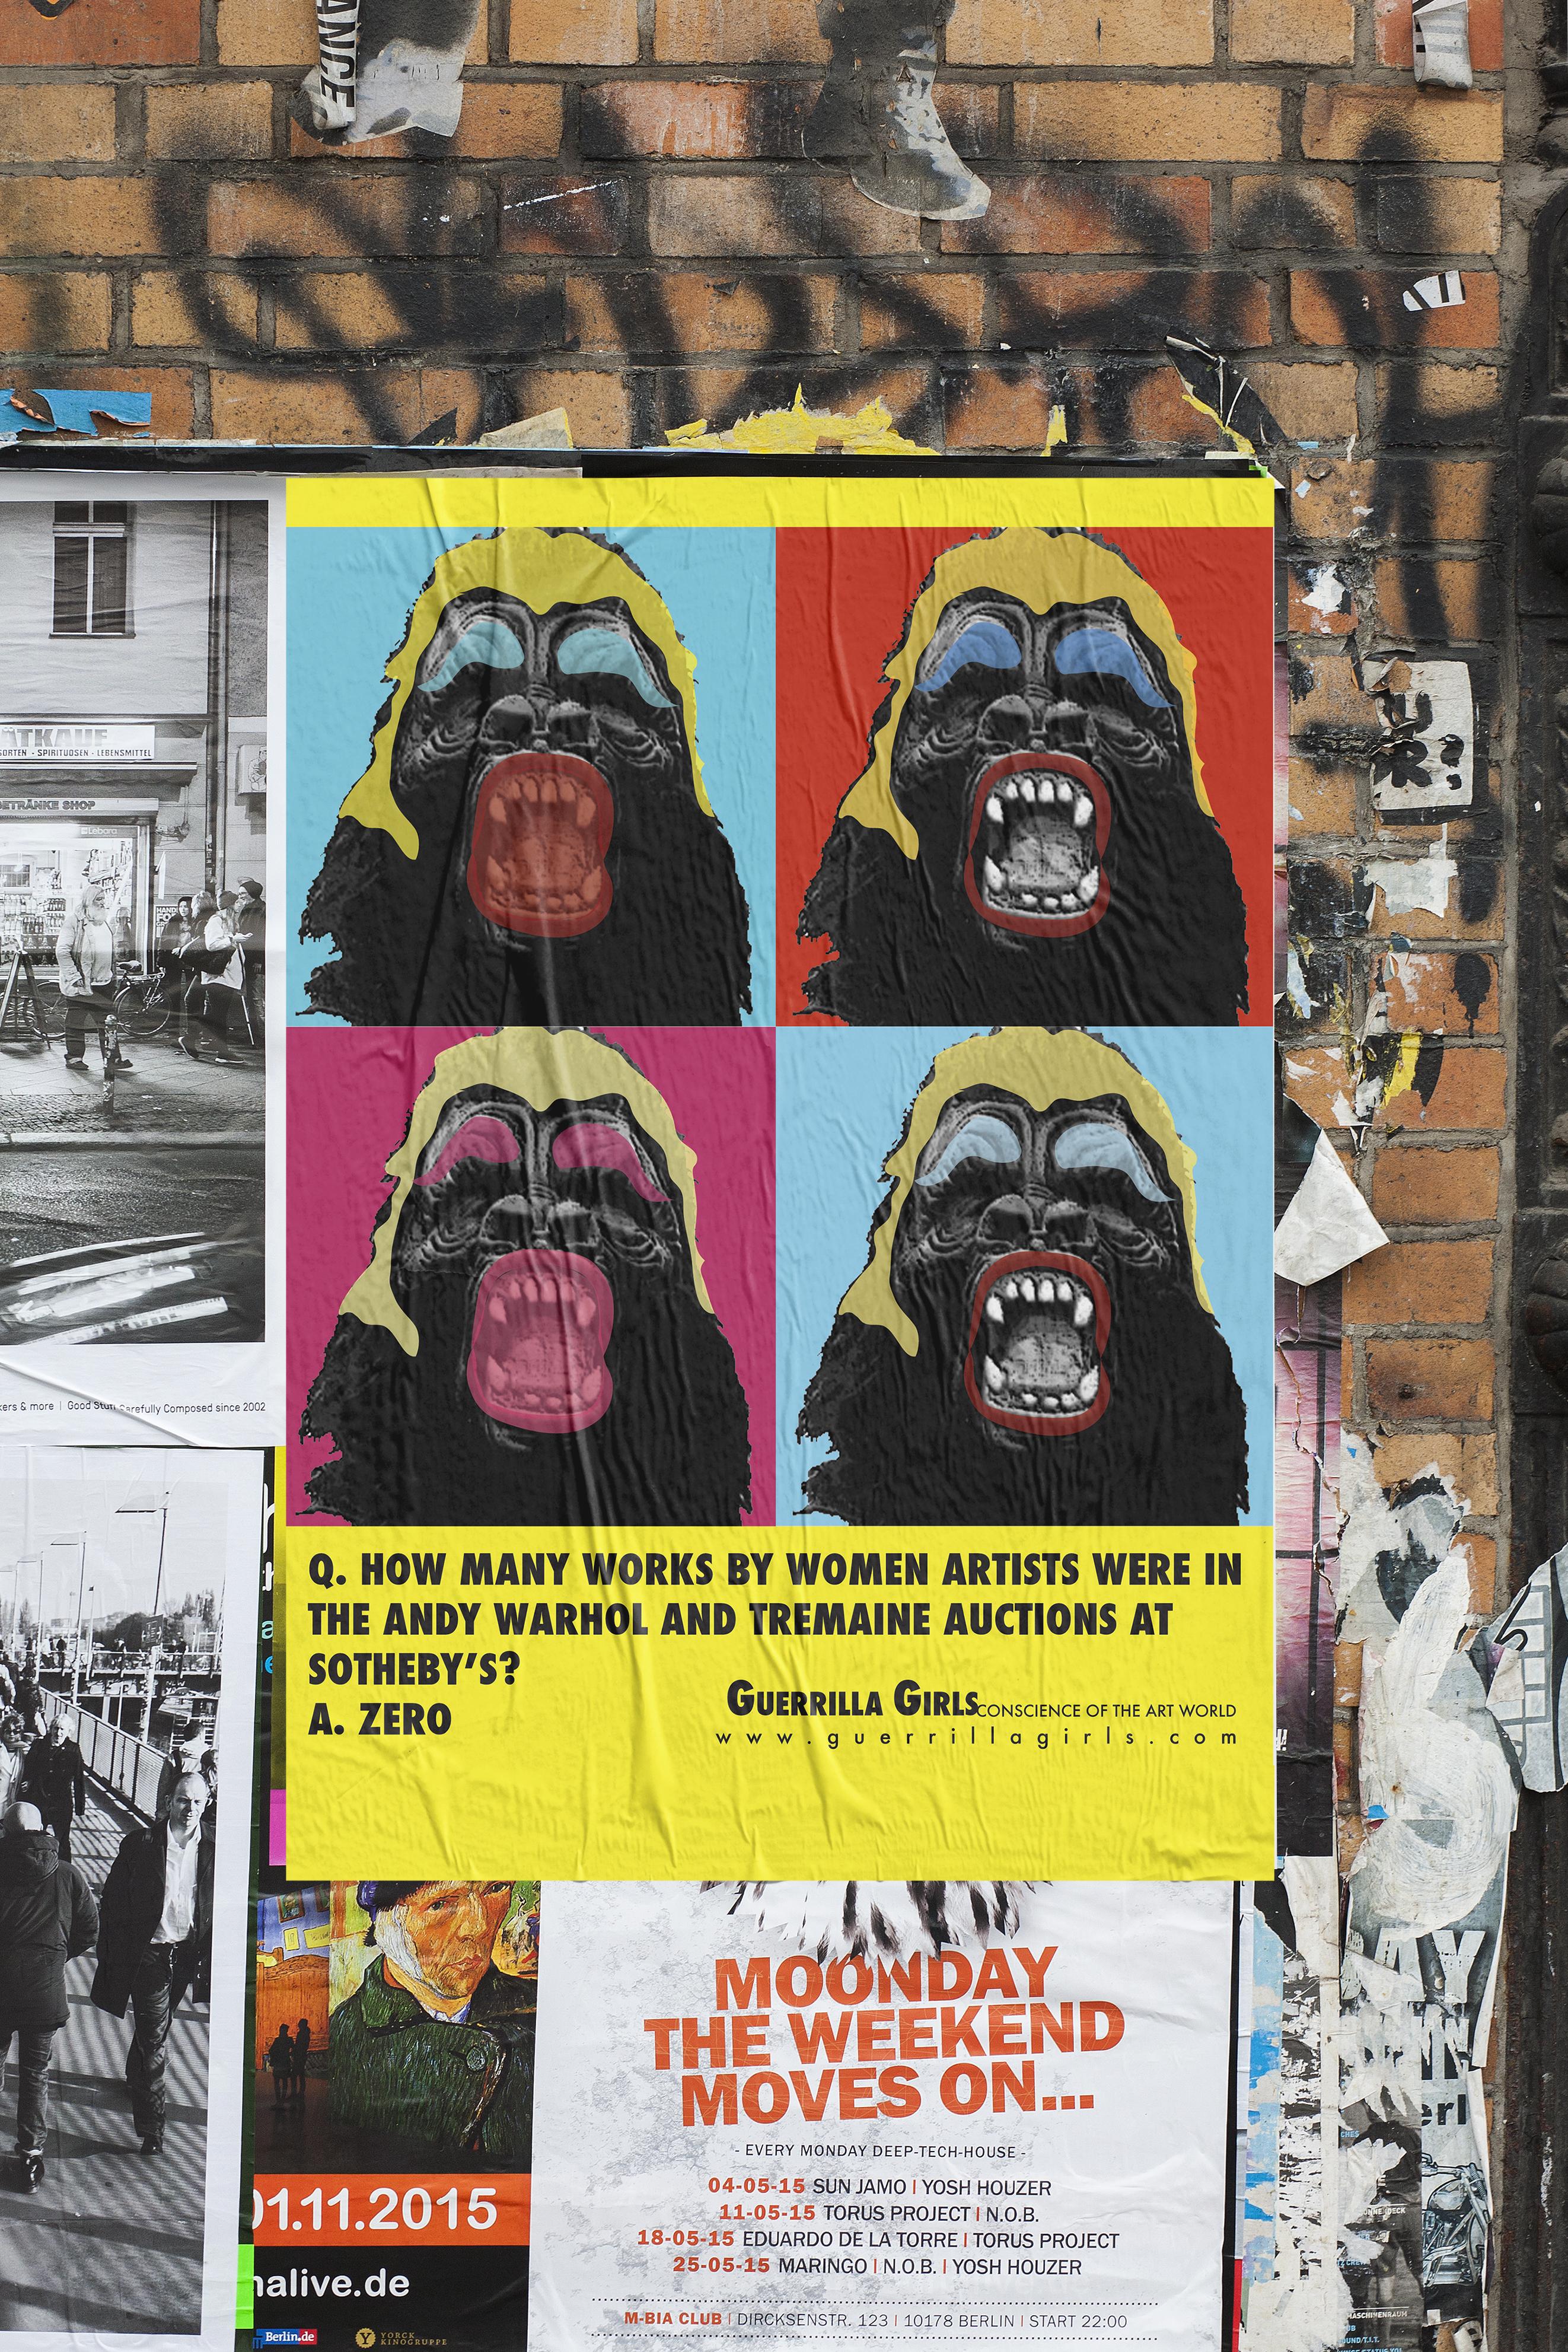 Guerilla Girls Poster Mockup.jpg